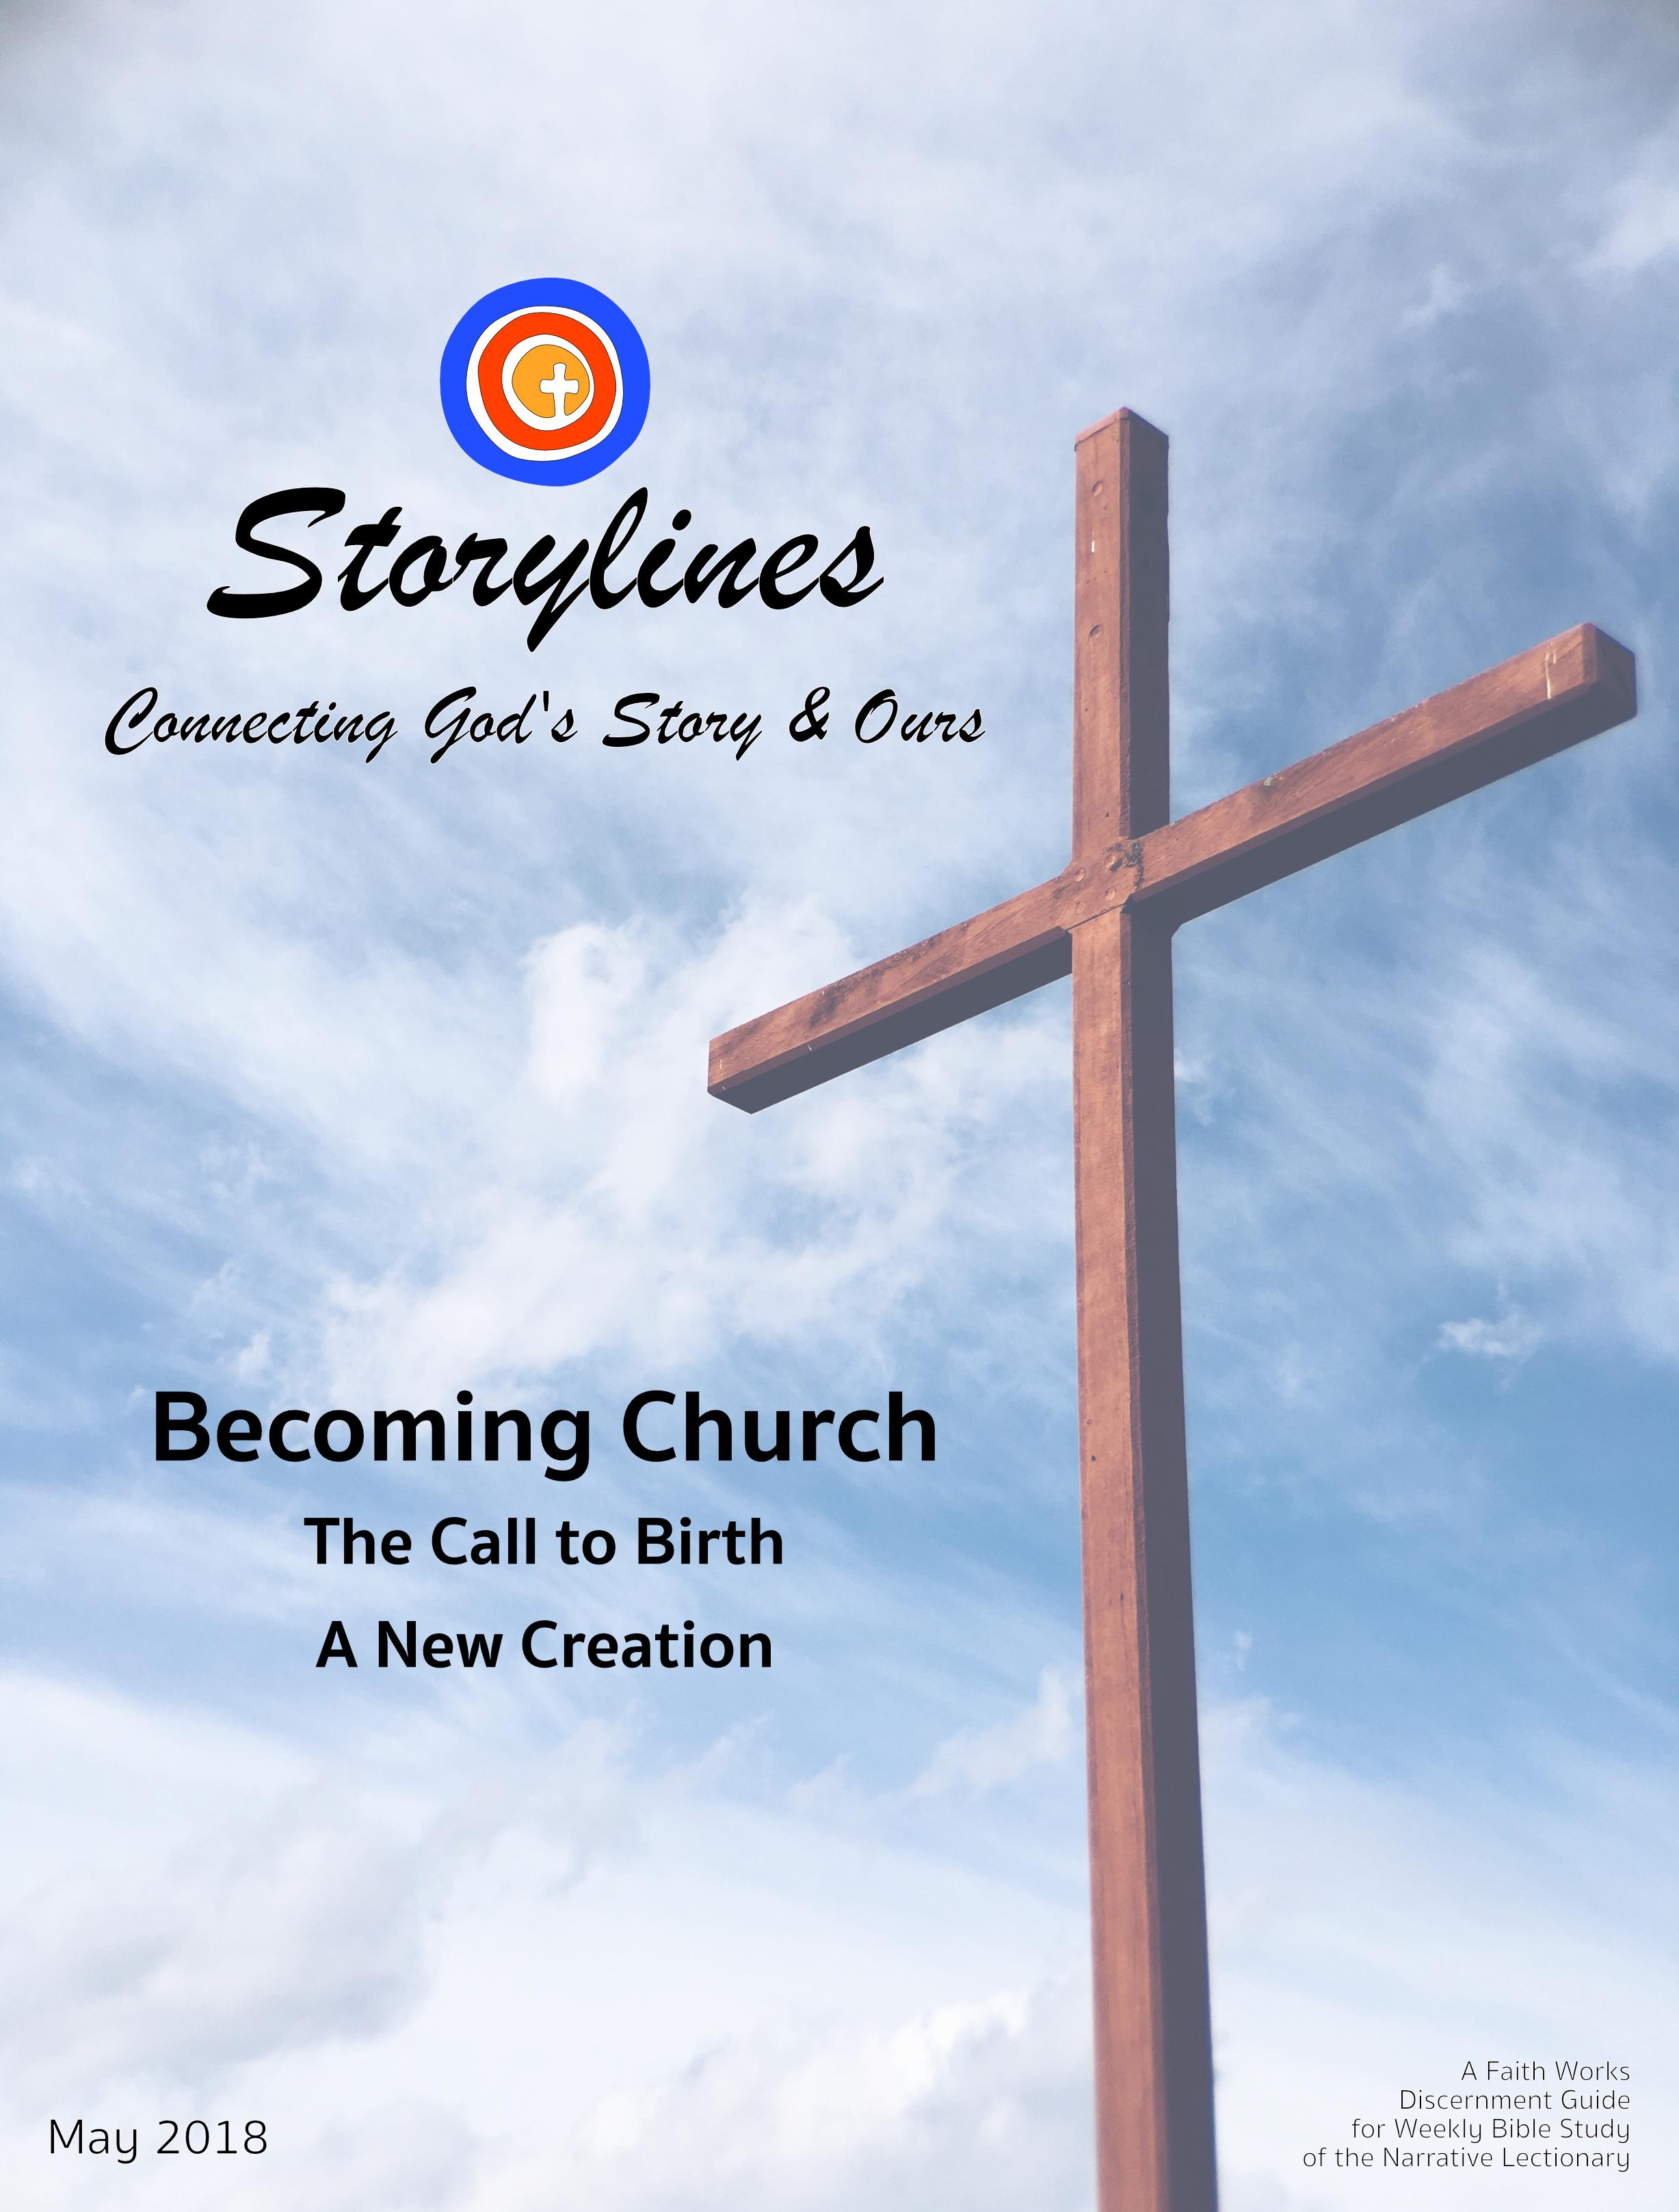 ST 2018-05 Storylines Cover.jpg